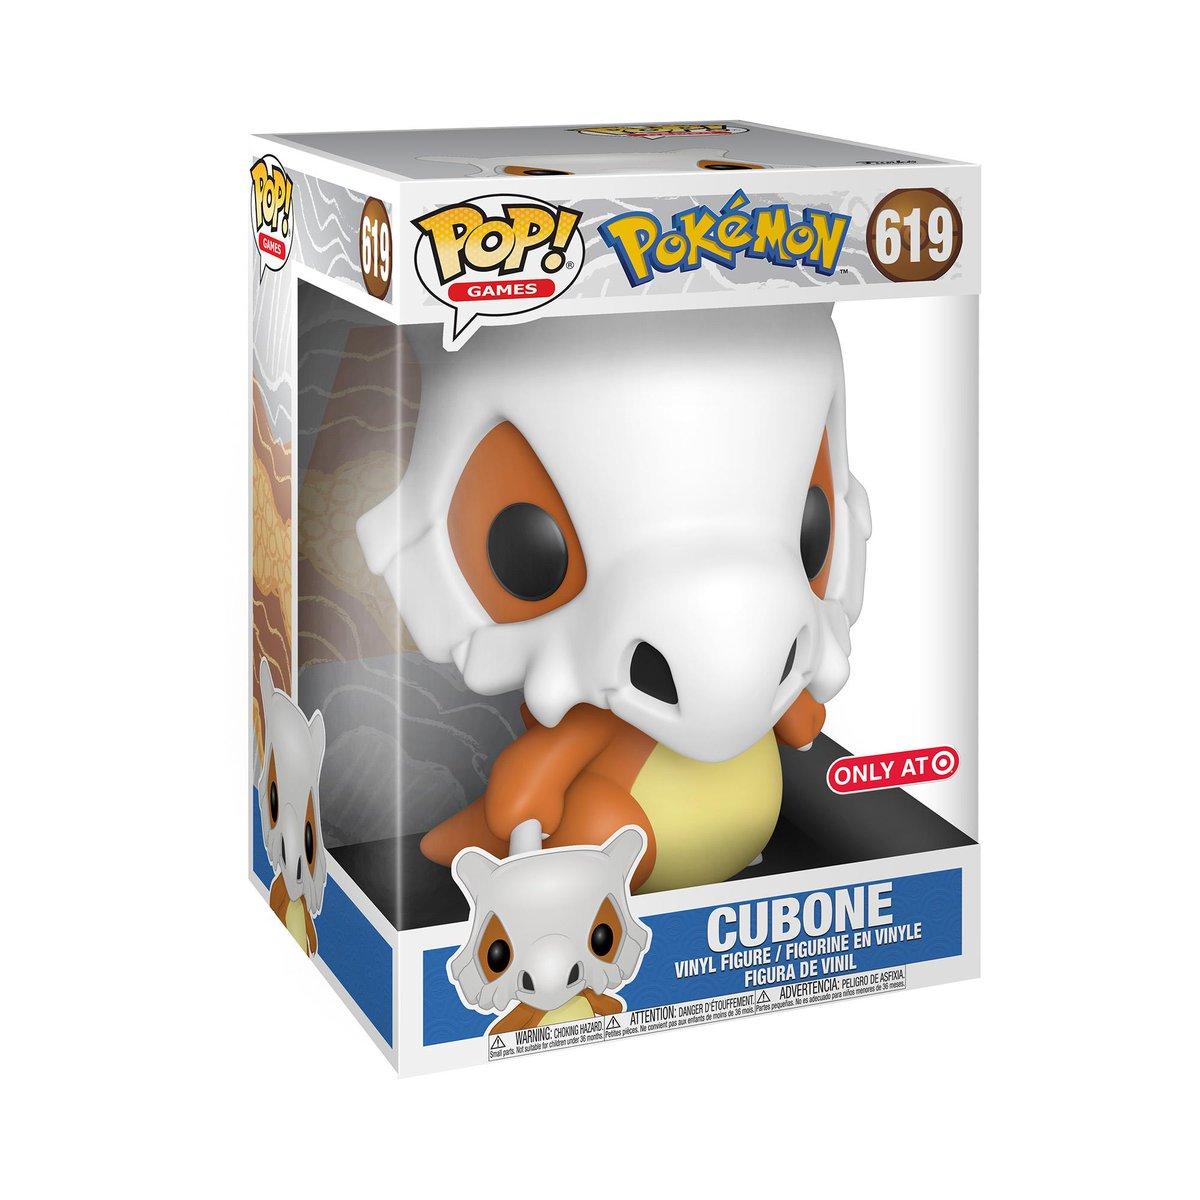 "RT & follow @OriginalFunko for the chance to WIN this @Target exclusive 10"" Cubone Pop!  #Funko #Funkogiveaway #giveaway #Pokemon #Cubone"